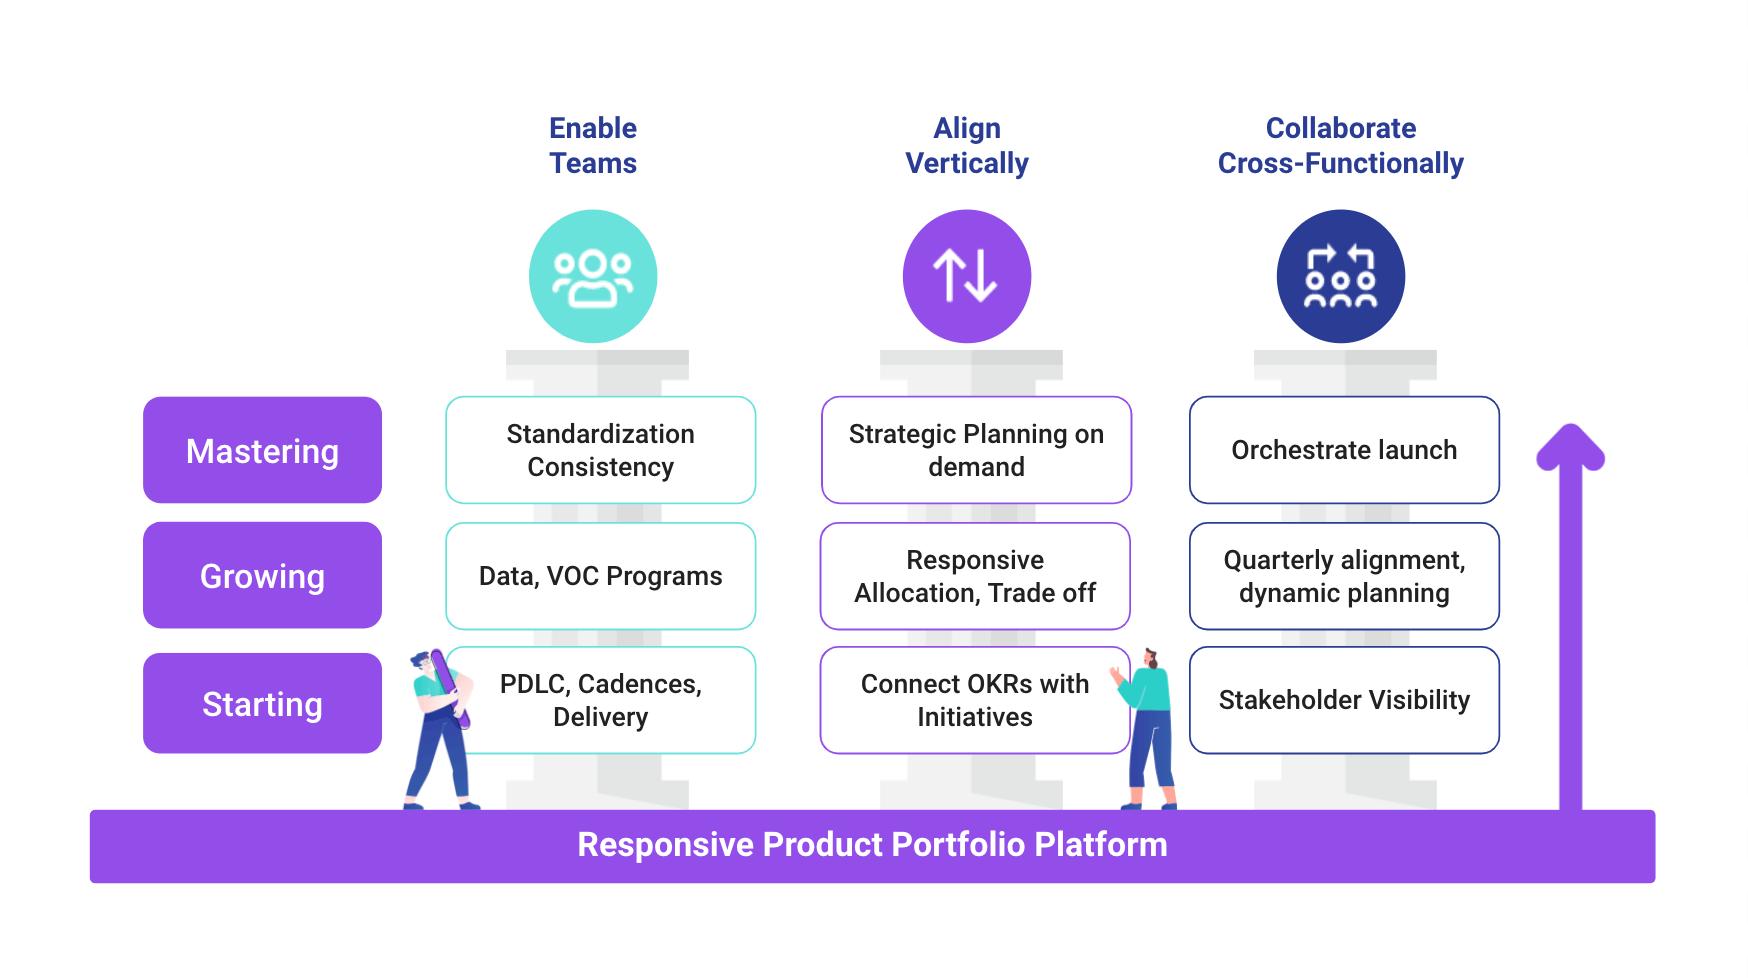 Responsive product portfolio platform